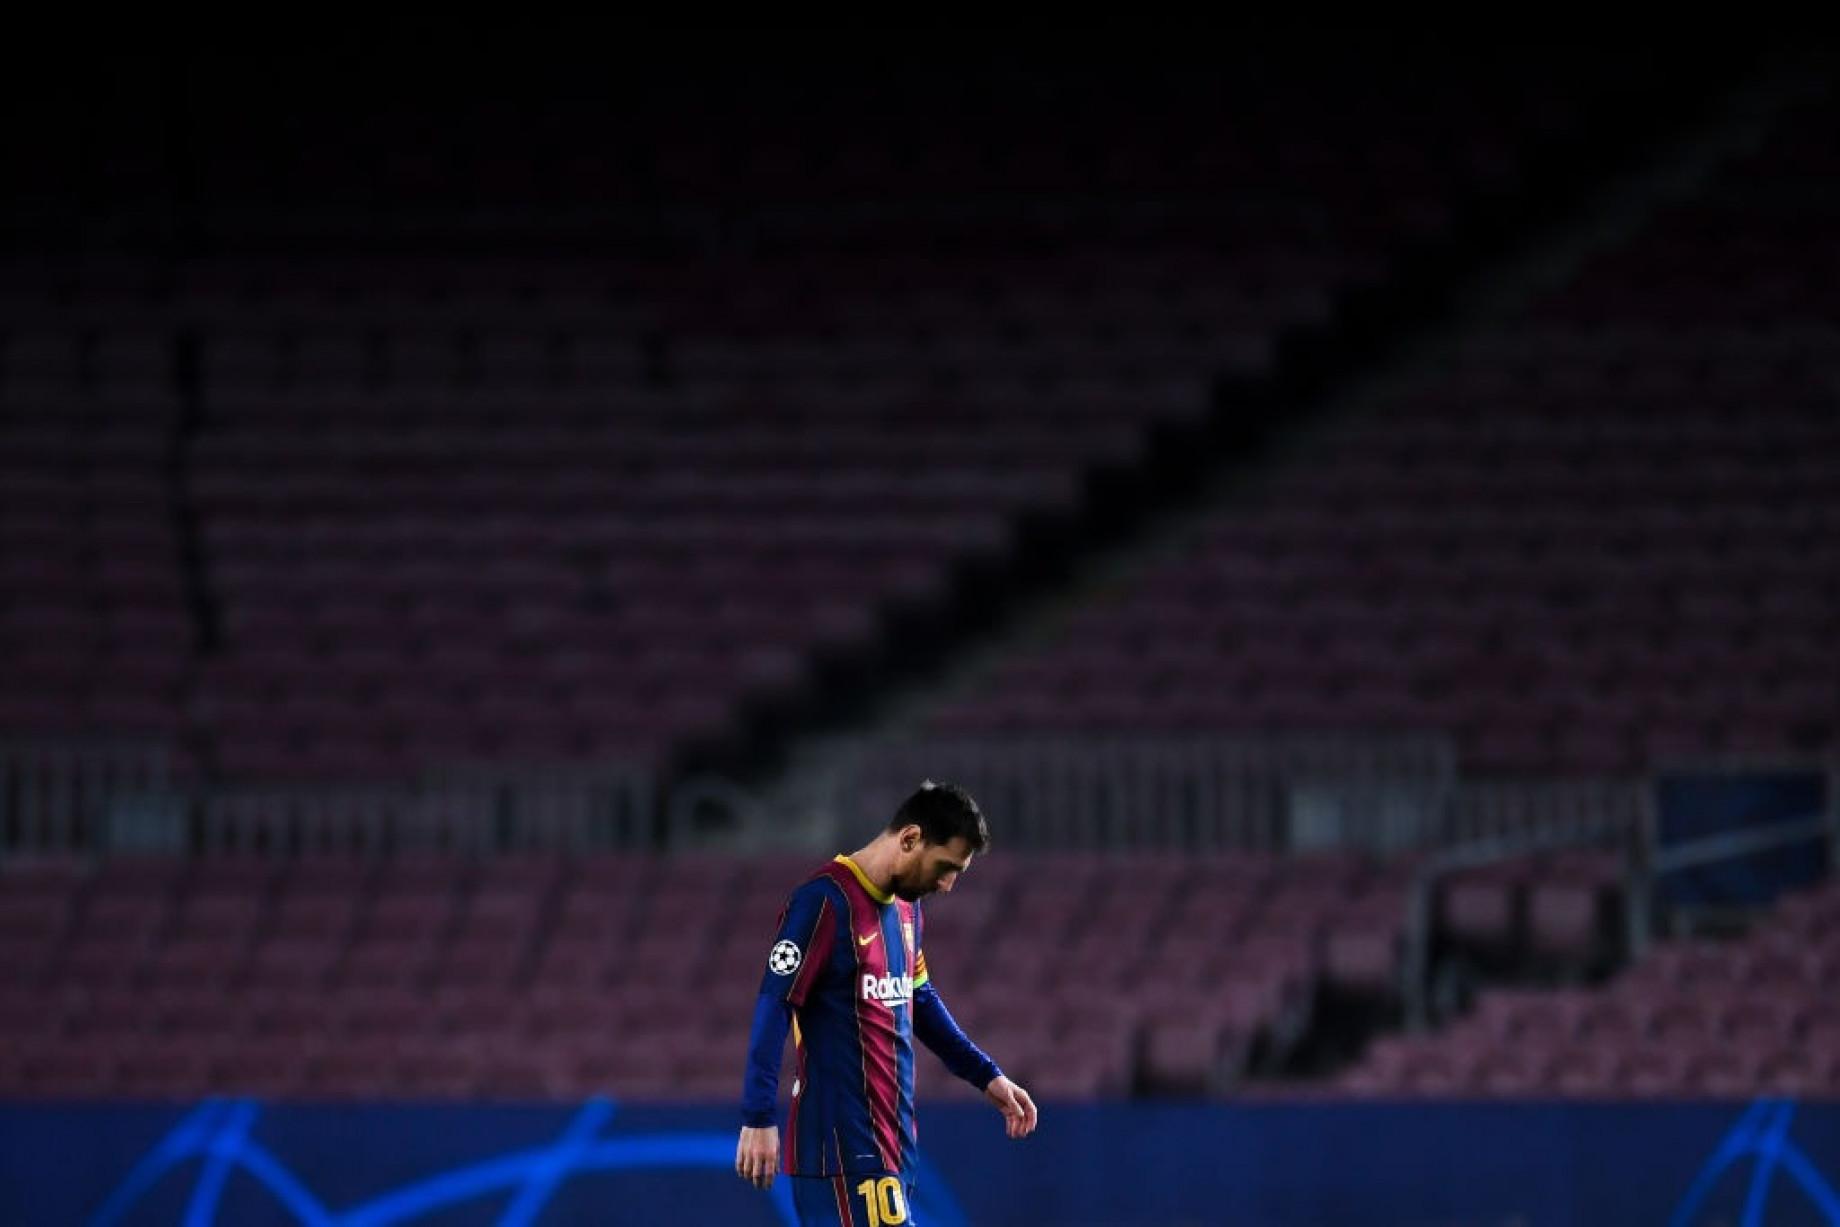 Barcellona PSG Messi Triste GETTY.jpeg